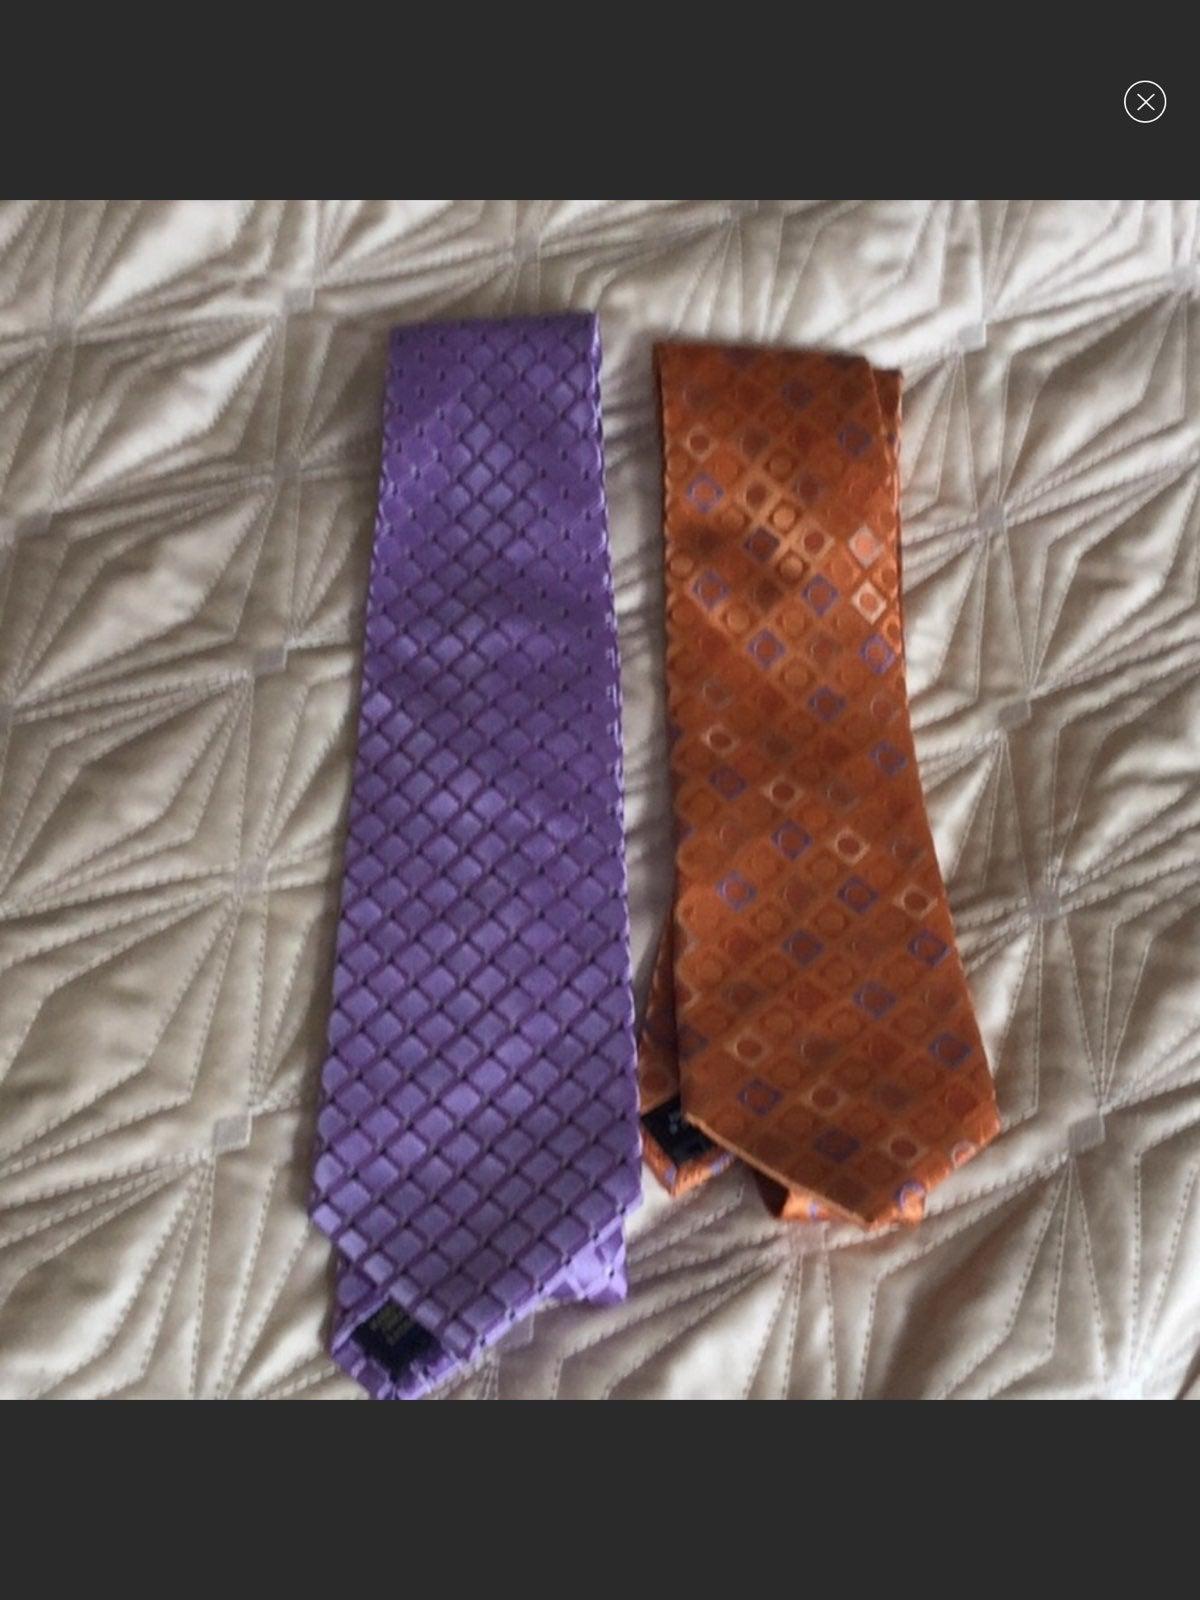 2 Michael Kors silk ties purple and  ora